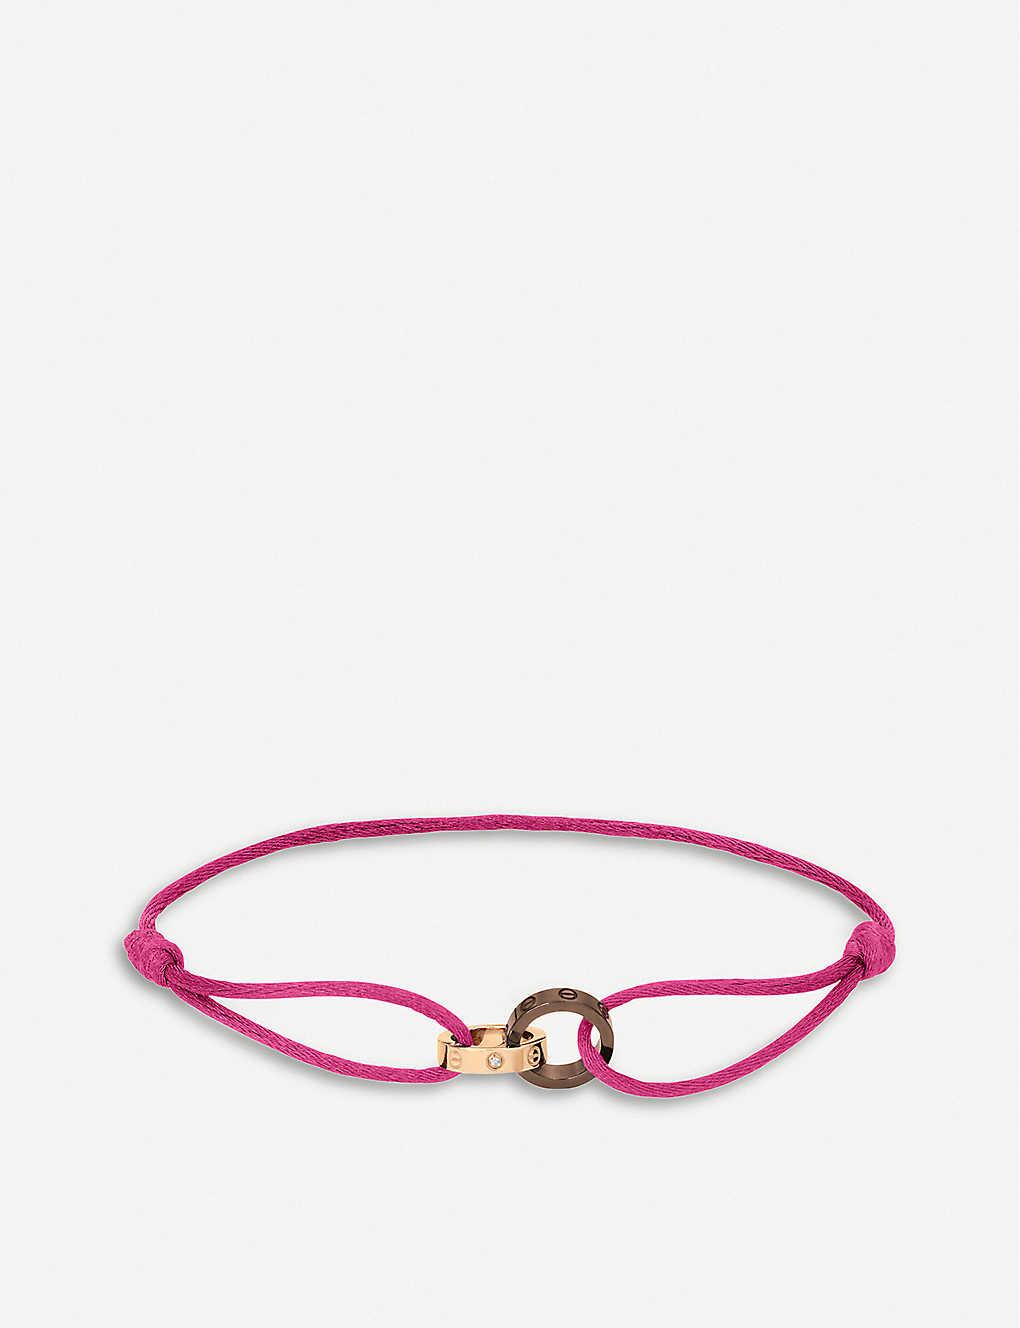 05d5662ff58d8 Love 18ct pink-gold, diamond and ceramic bracelet